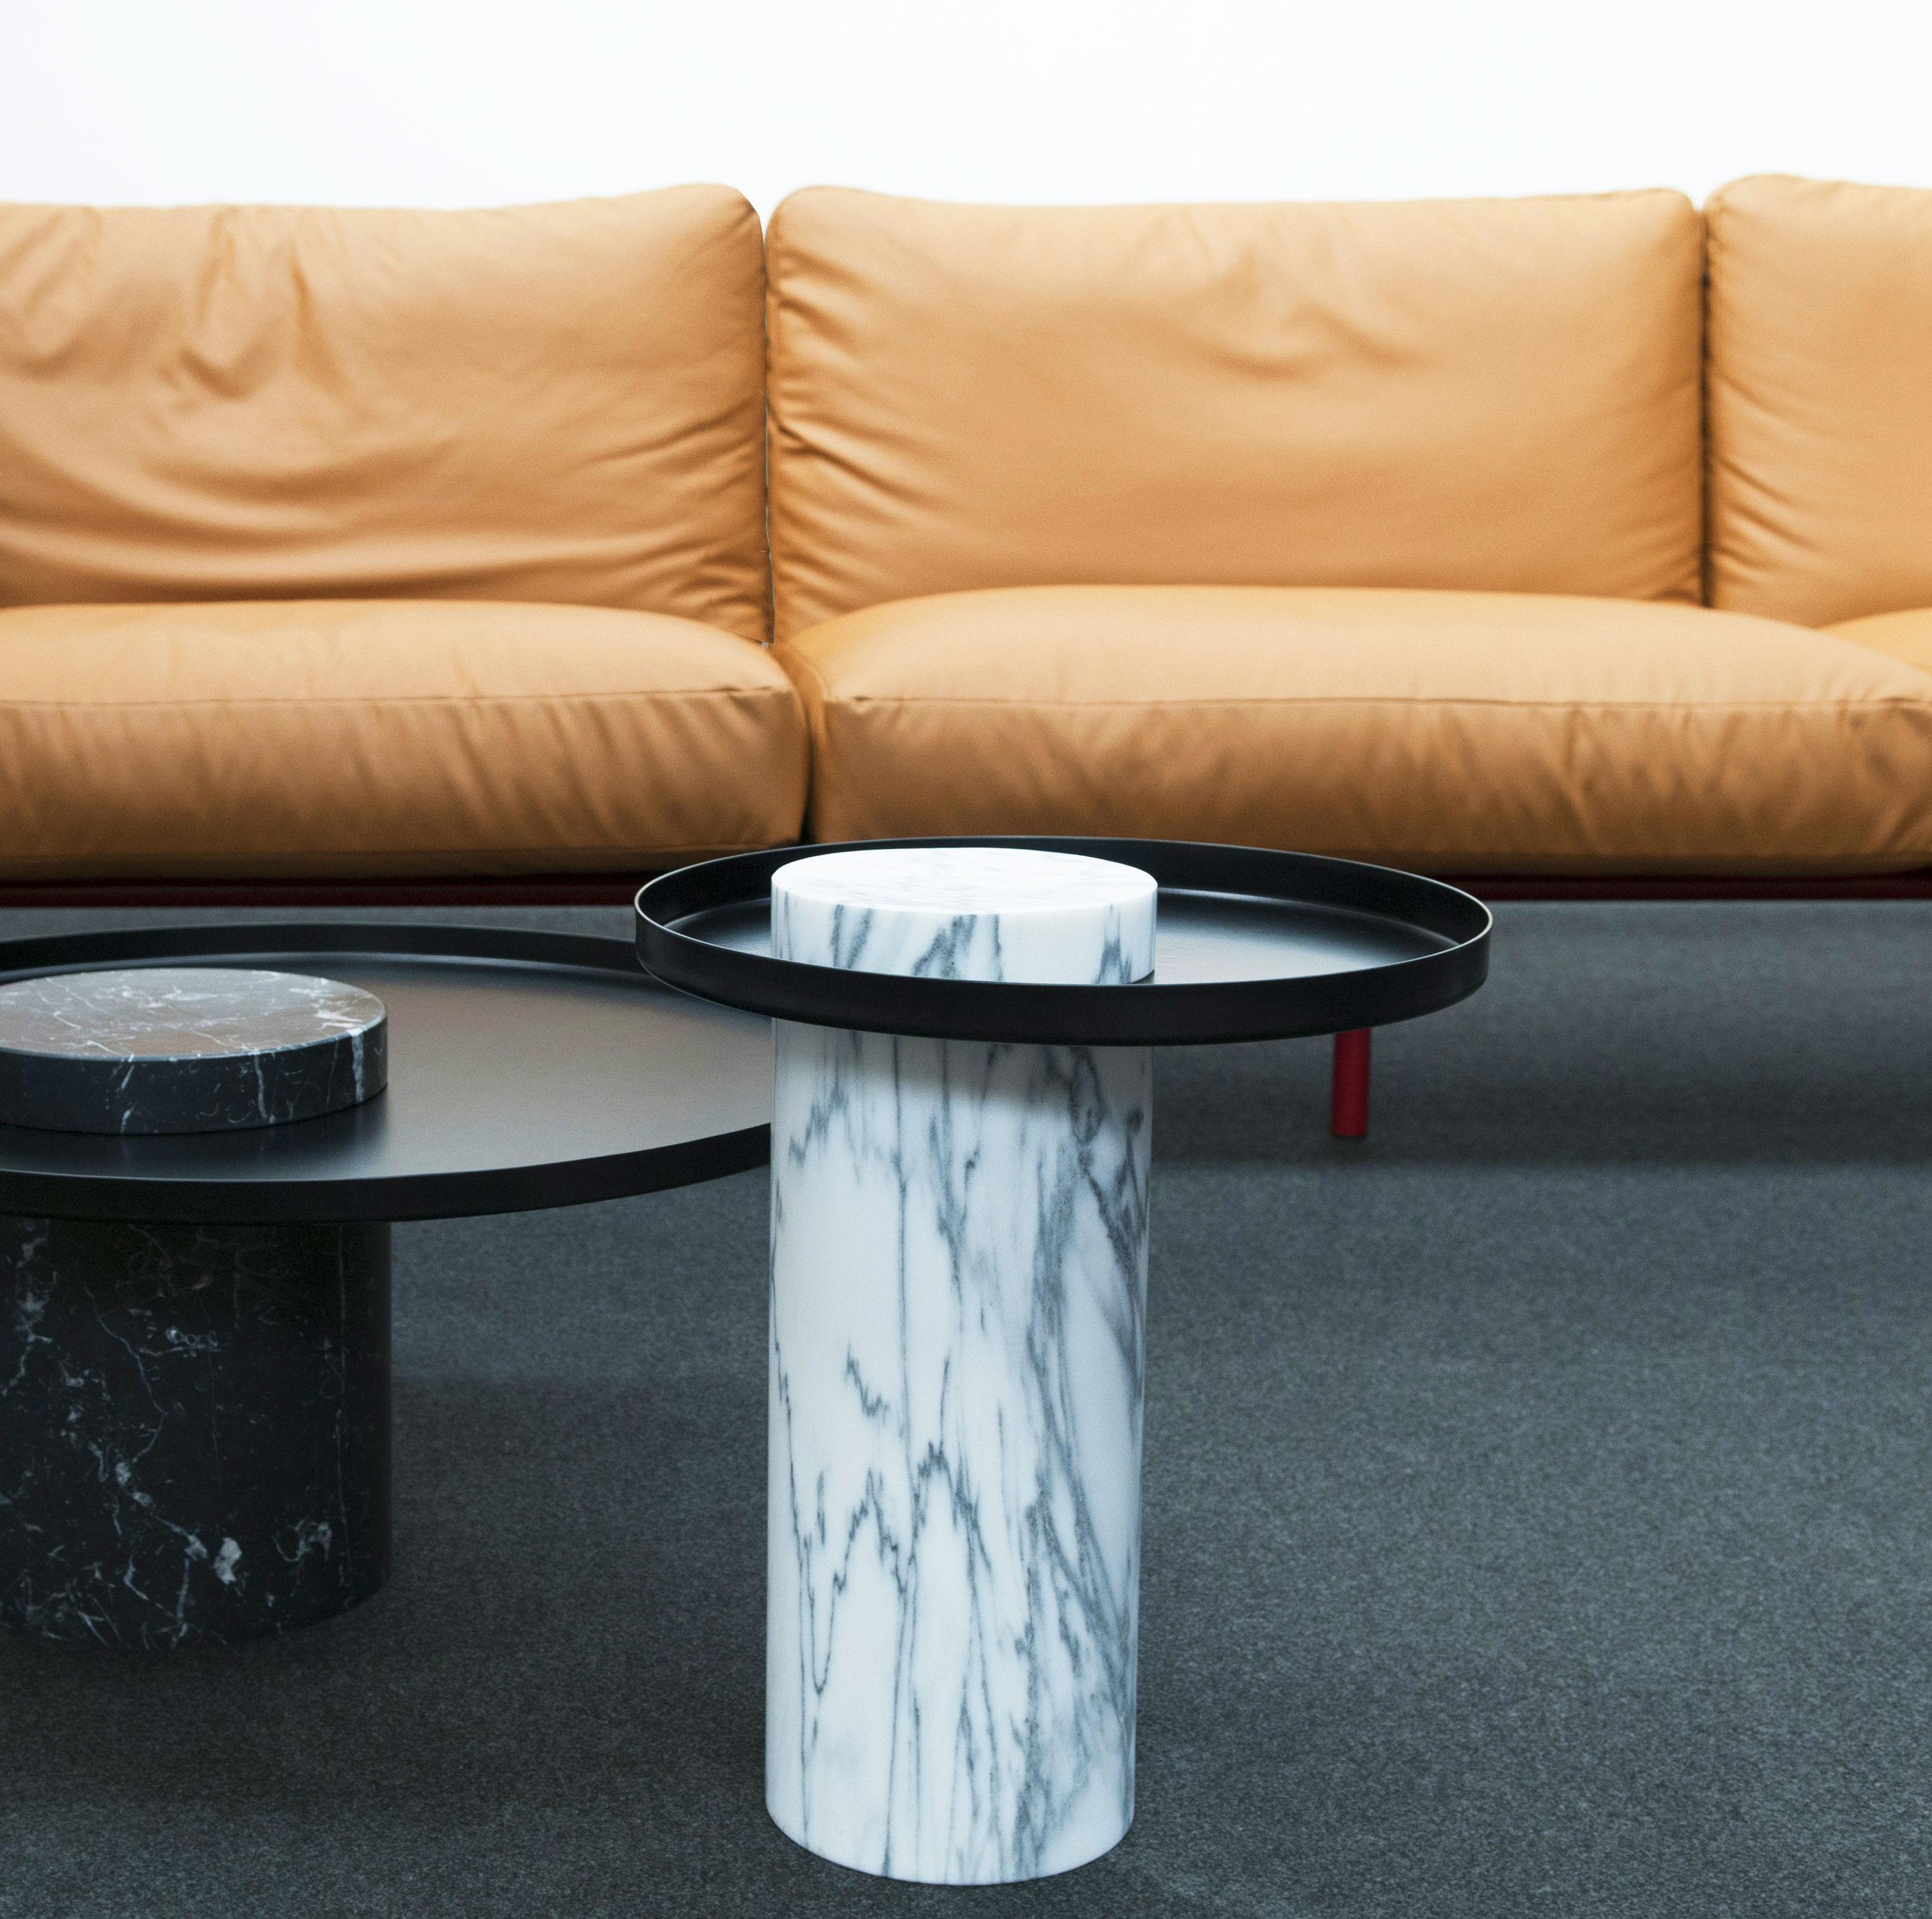 table d 39 appoint salute la chance marbre blanc plateau noir h 46 x 40 made in design. Black Bedroom Furniture Sets. Home Design Ideas